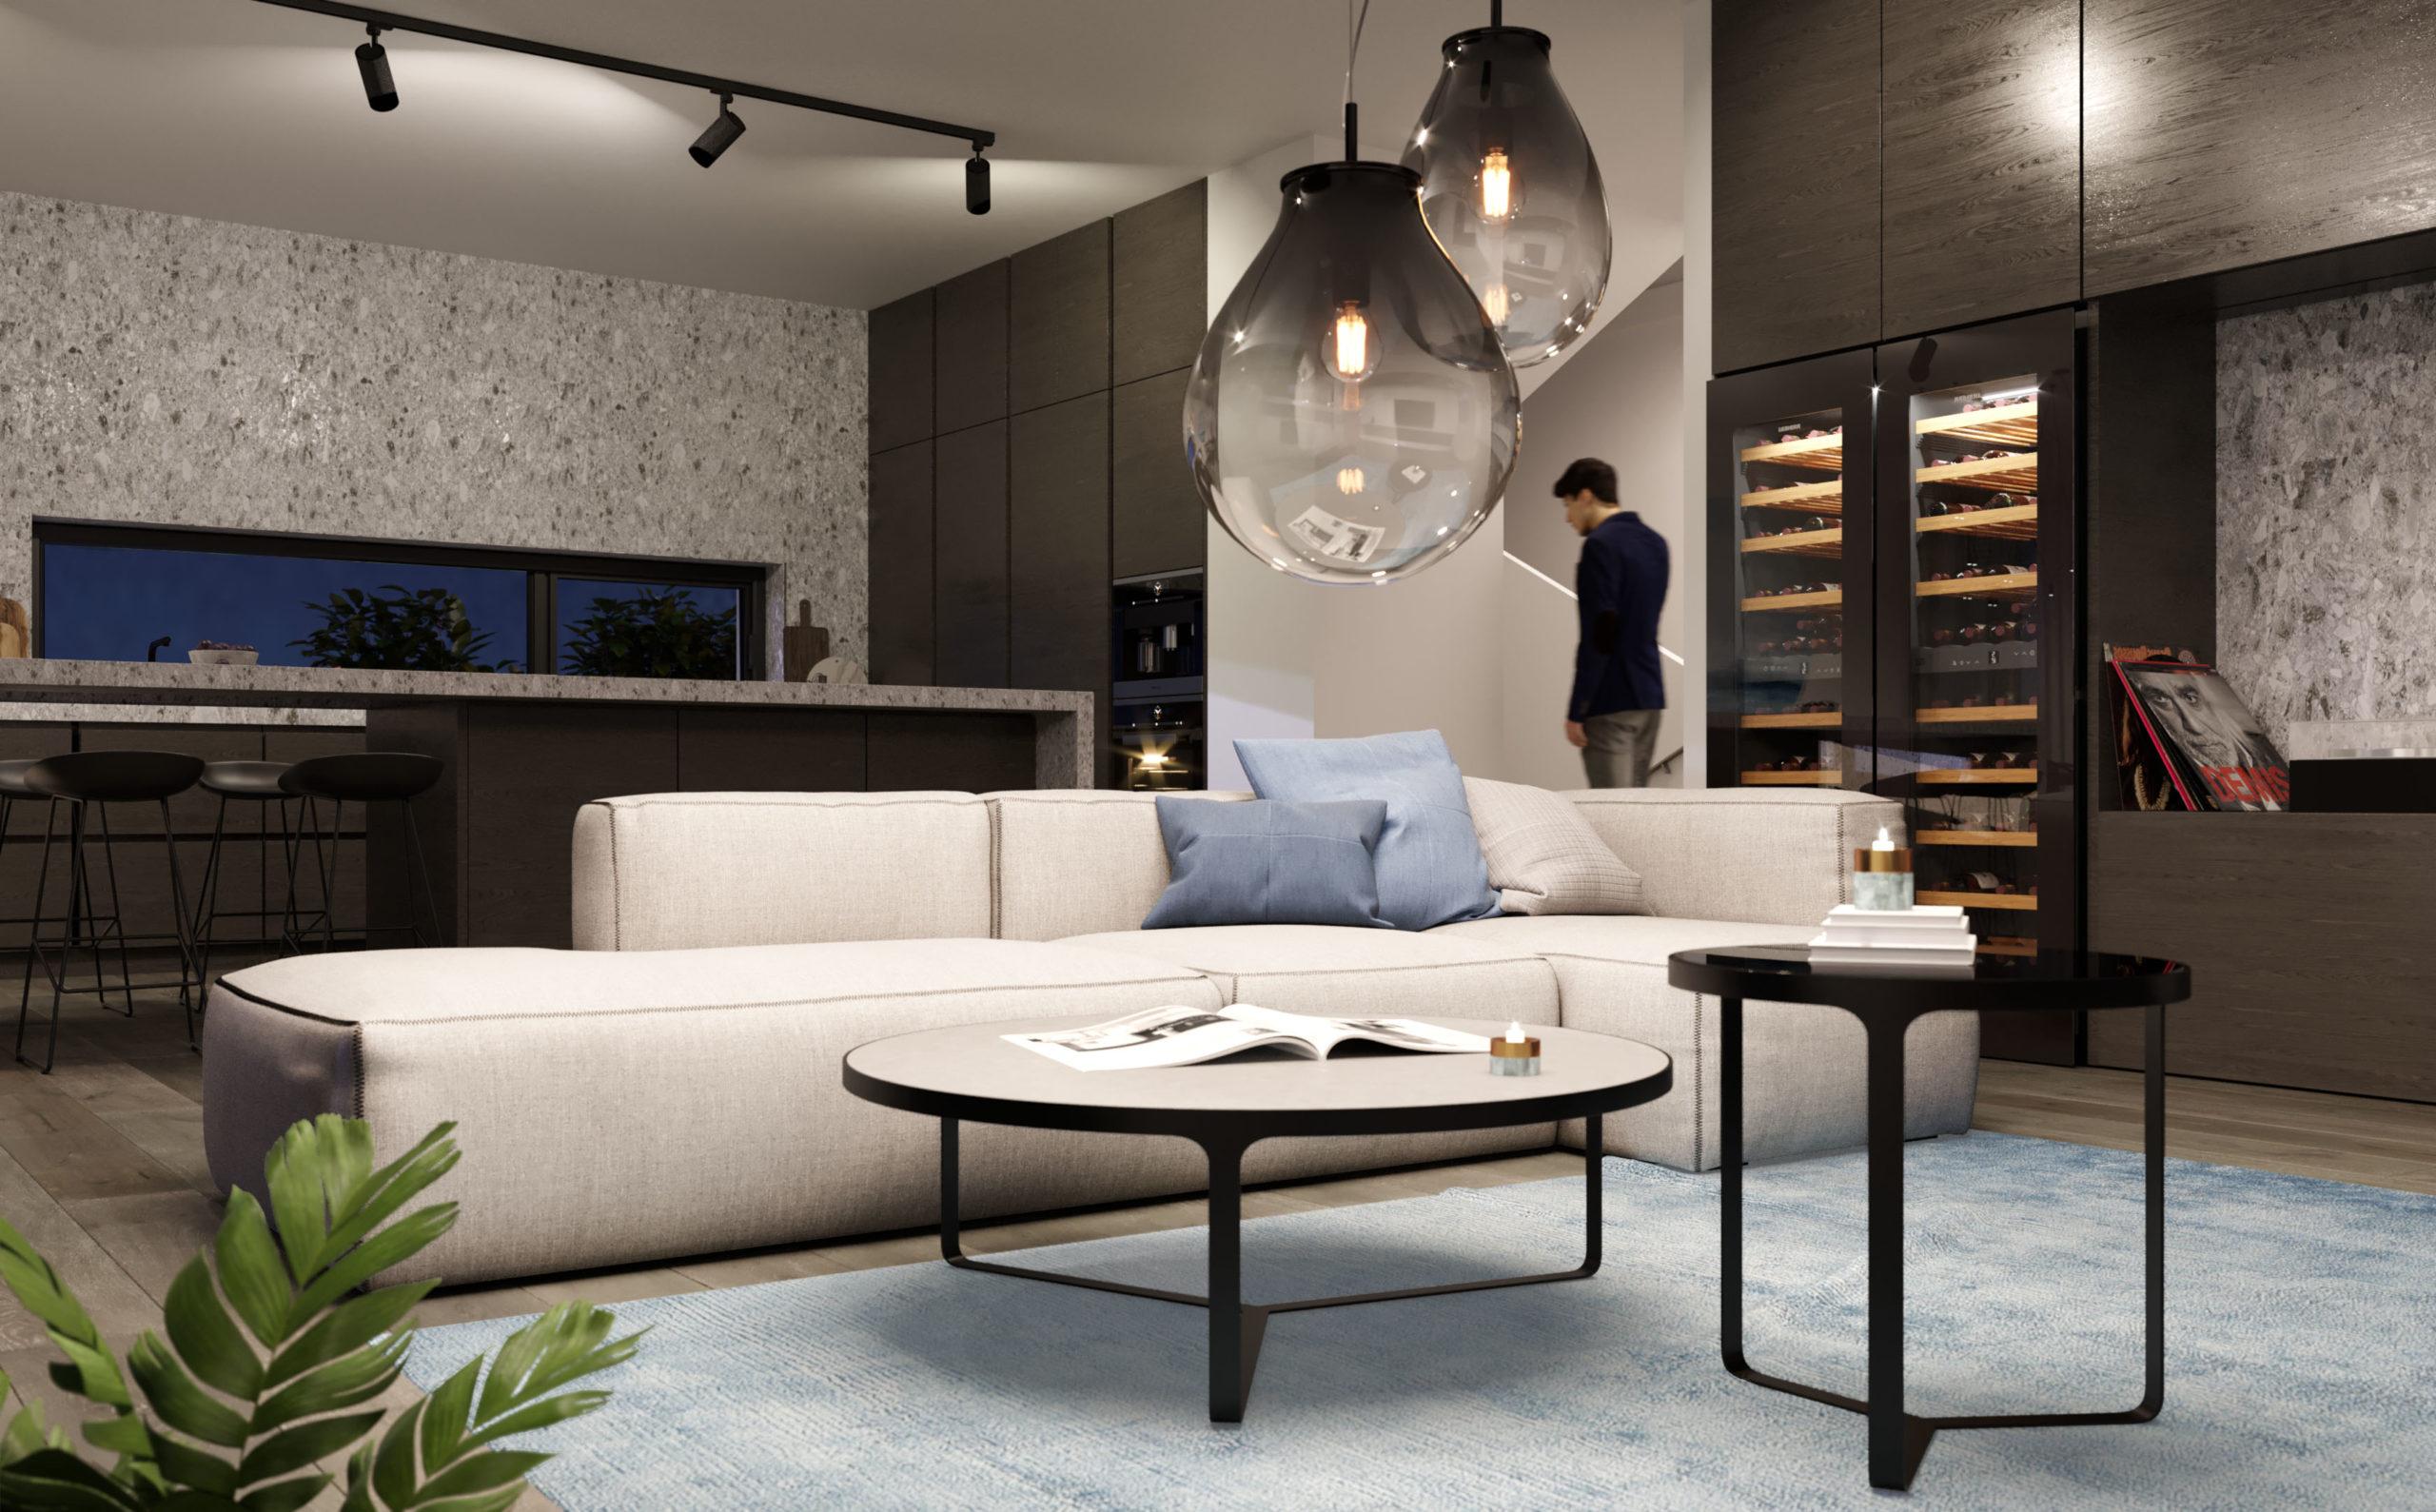 Obývací pokoj plný luxusu